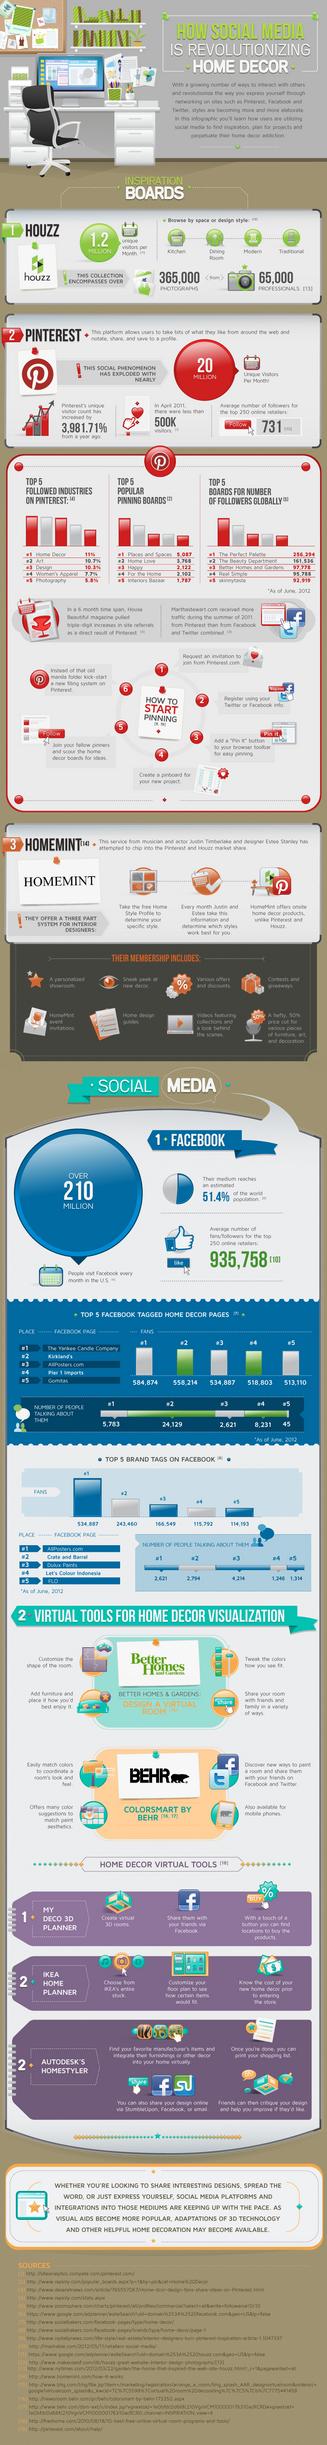 How Social Media is Revolutionizing Home Decor by SE7ENART